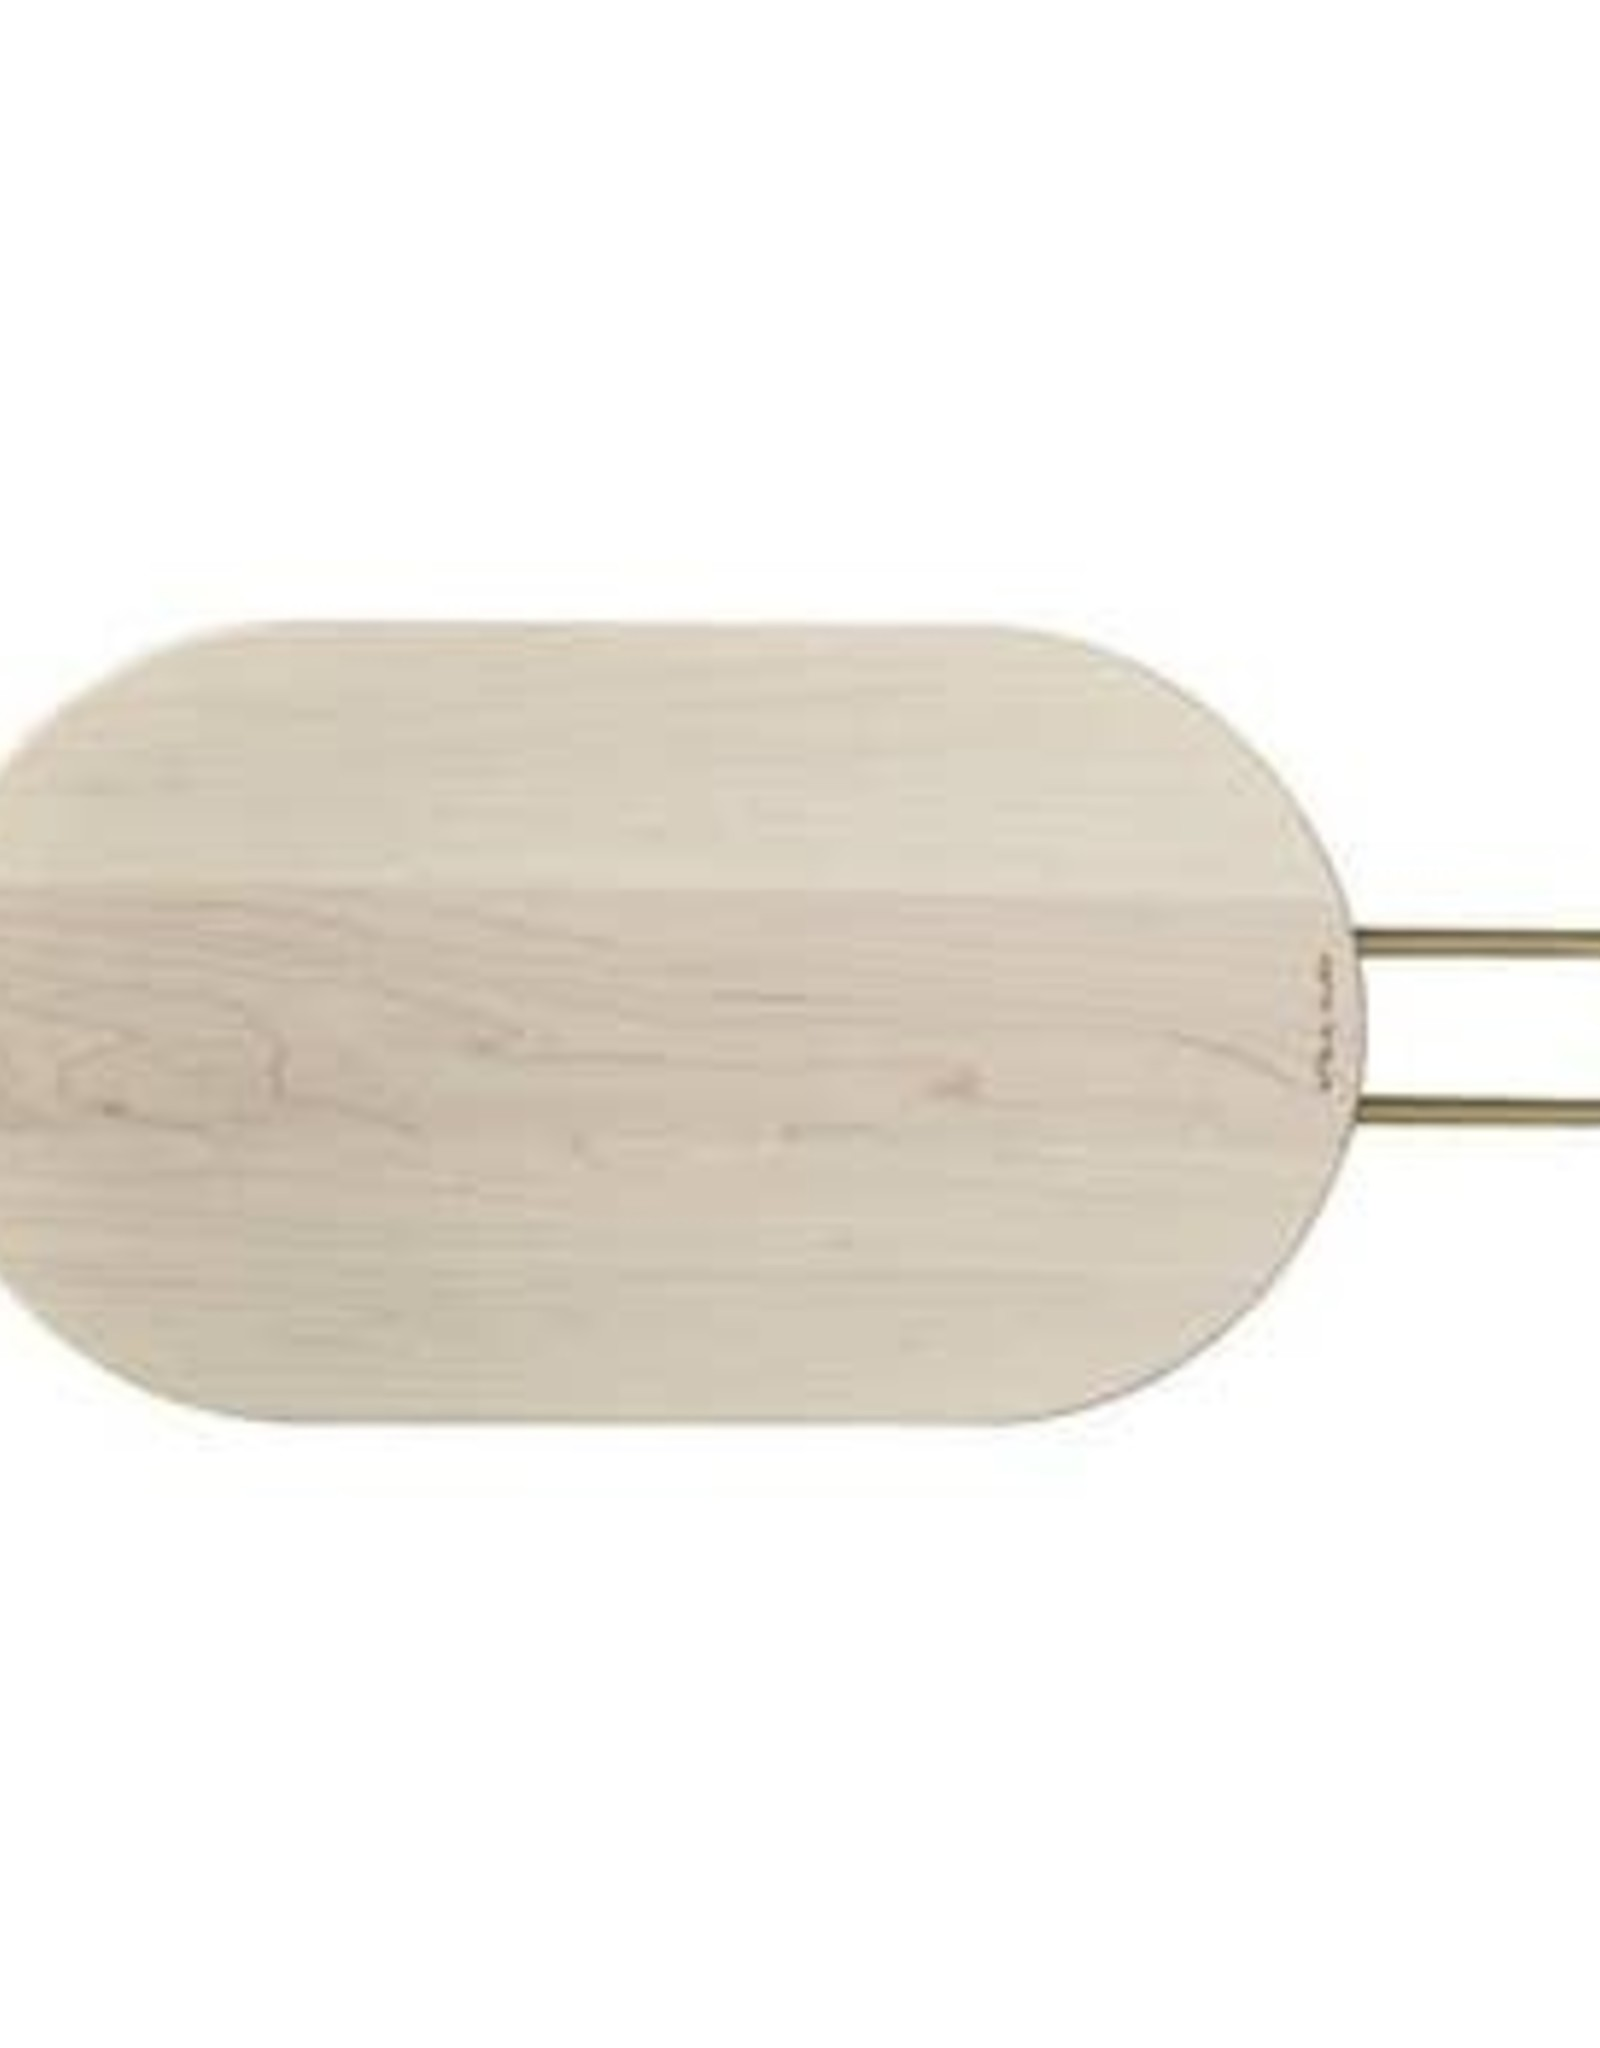 "Heath Wide Pill Cheese Board L15"" W8"""